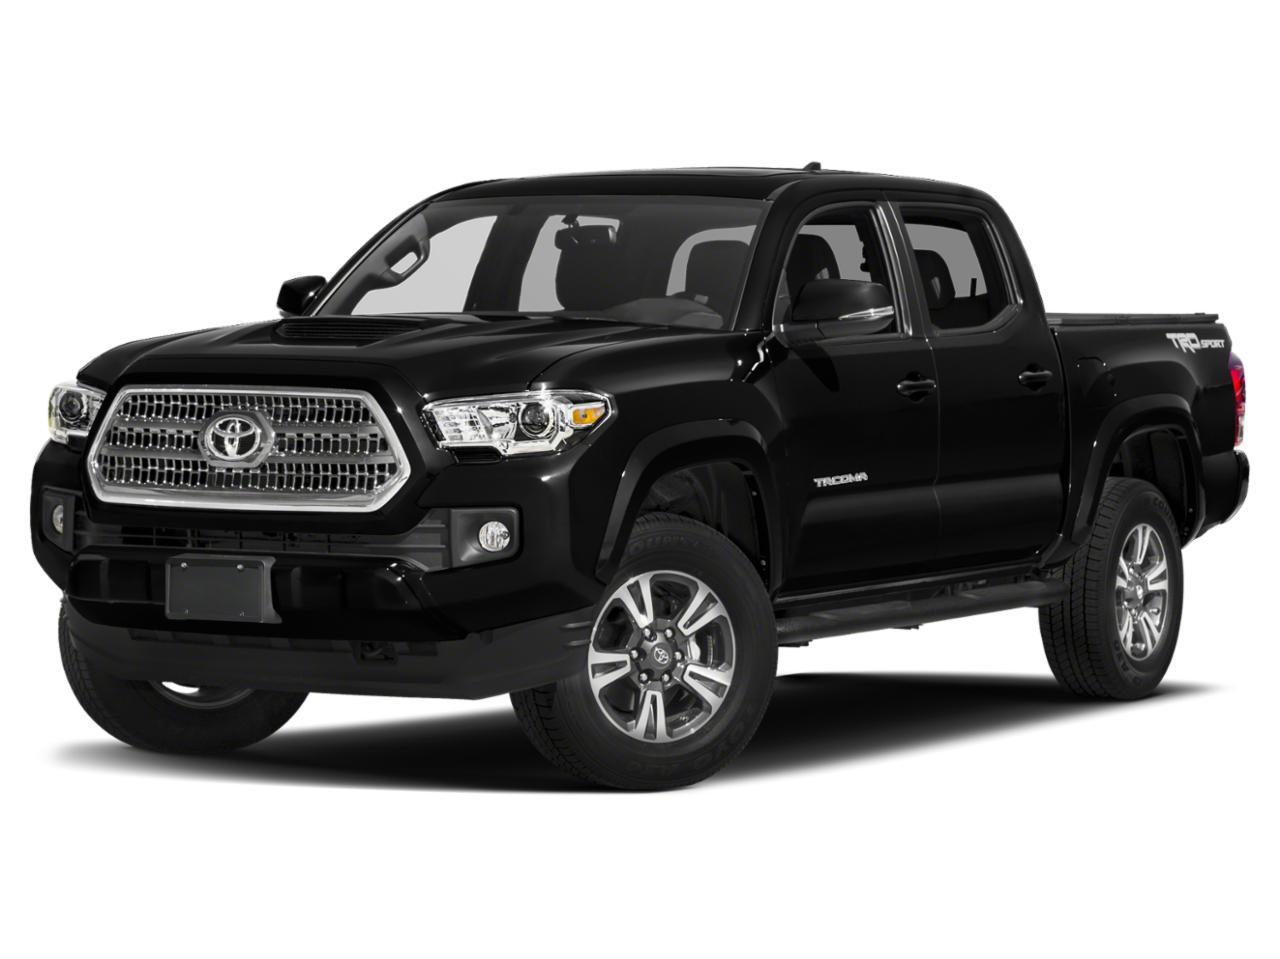 2018 Toyota Tacoma Vehicle Photo in Corpus Christi, TX 78411